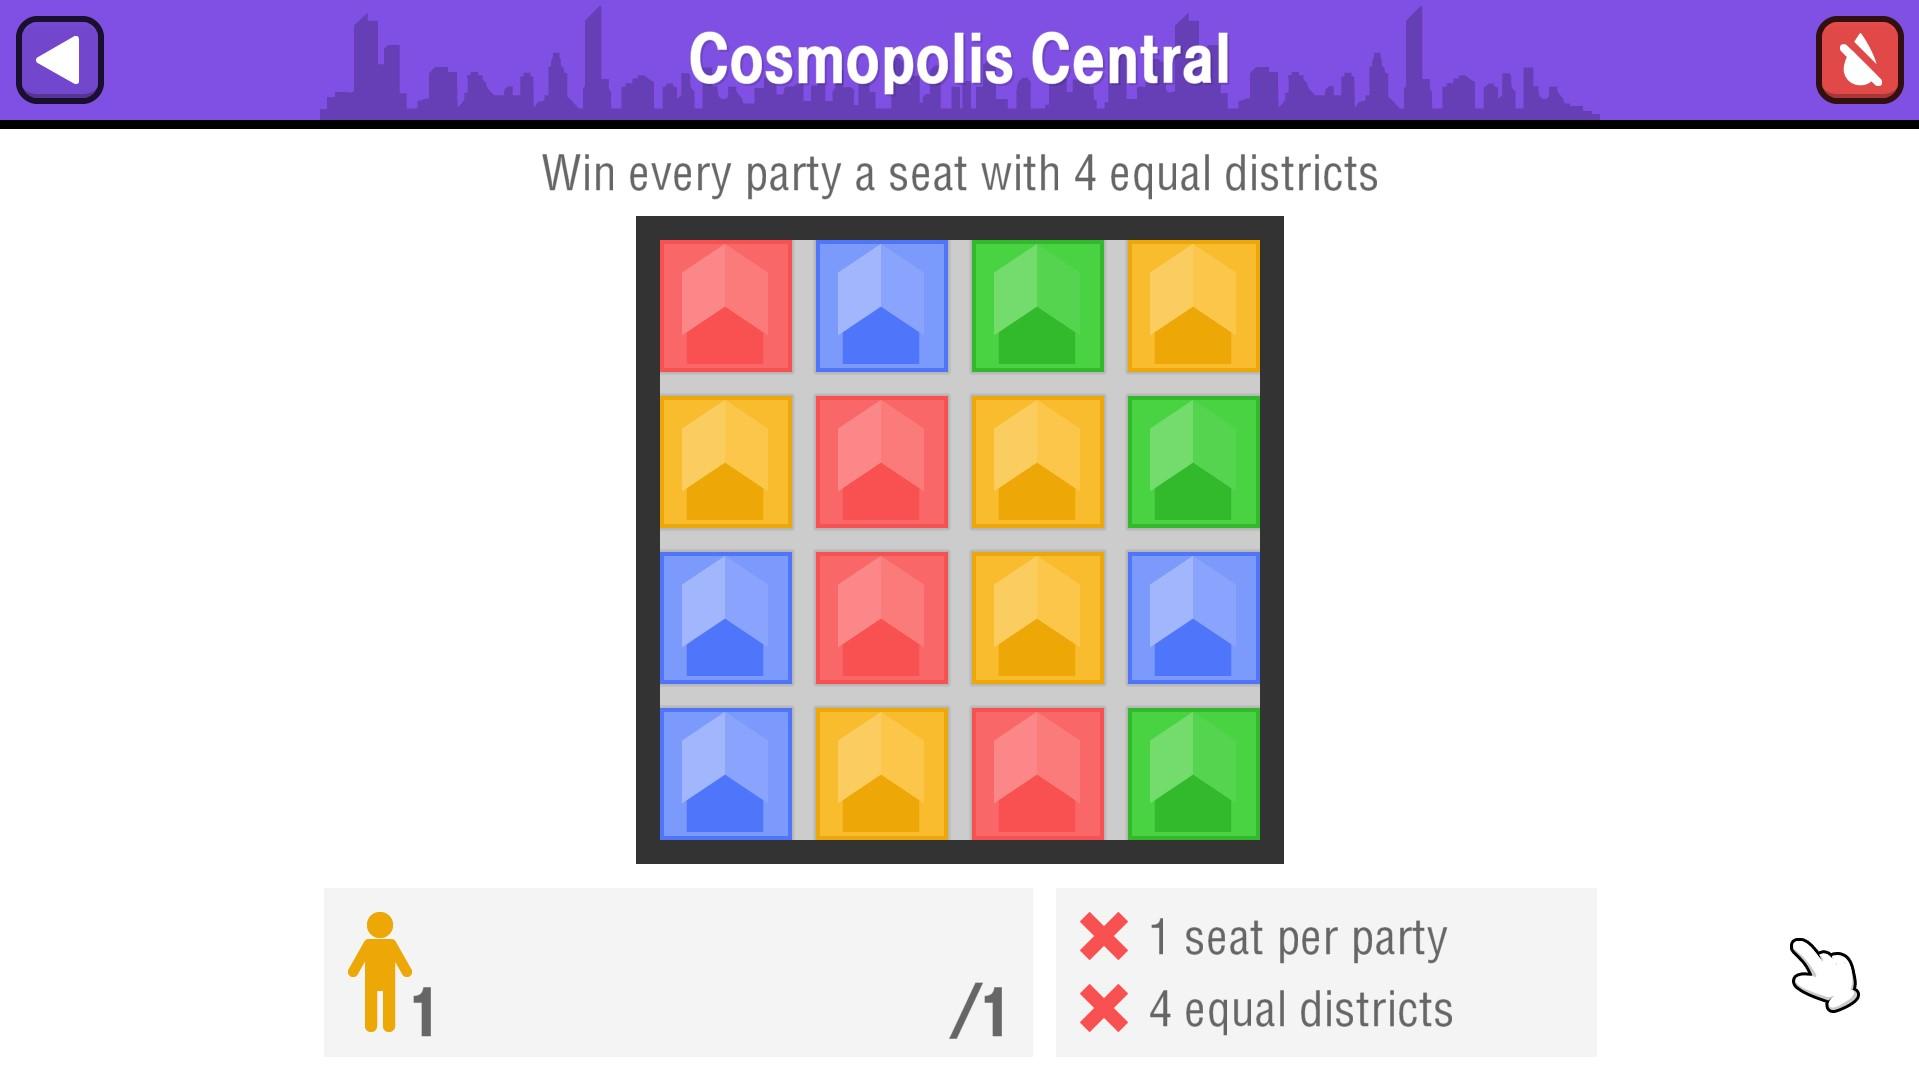 Cosmopolis Central